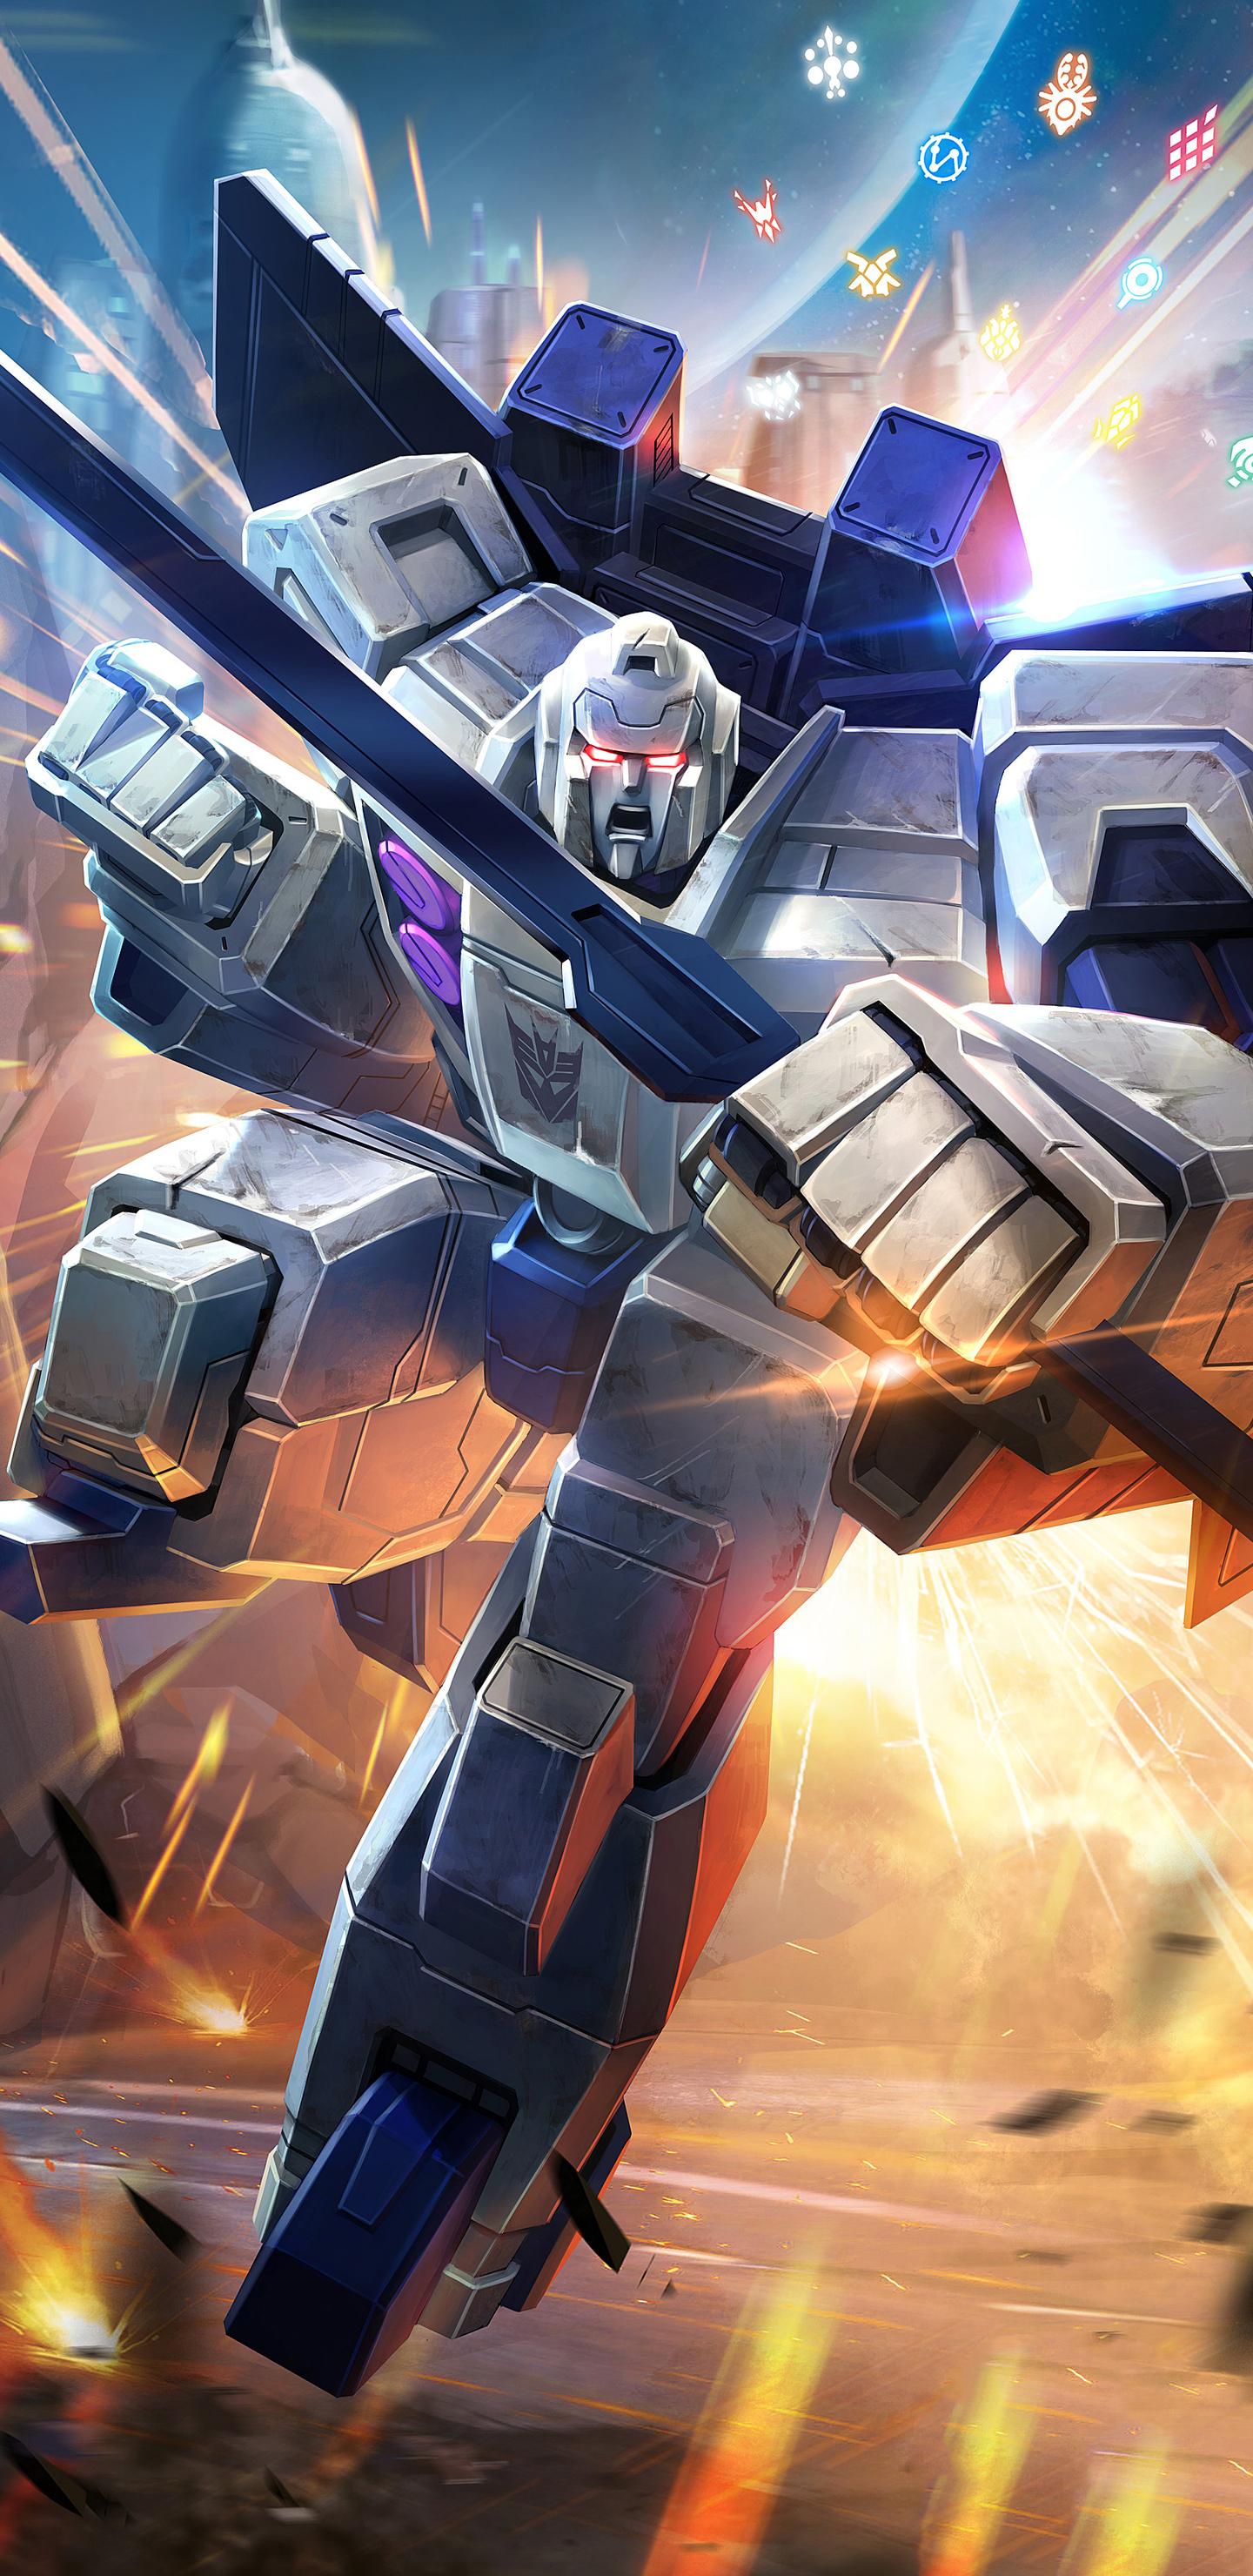 autobots-transformers-artwork-c9.jpg